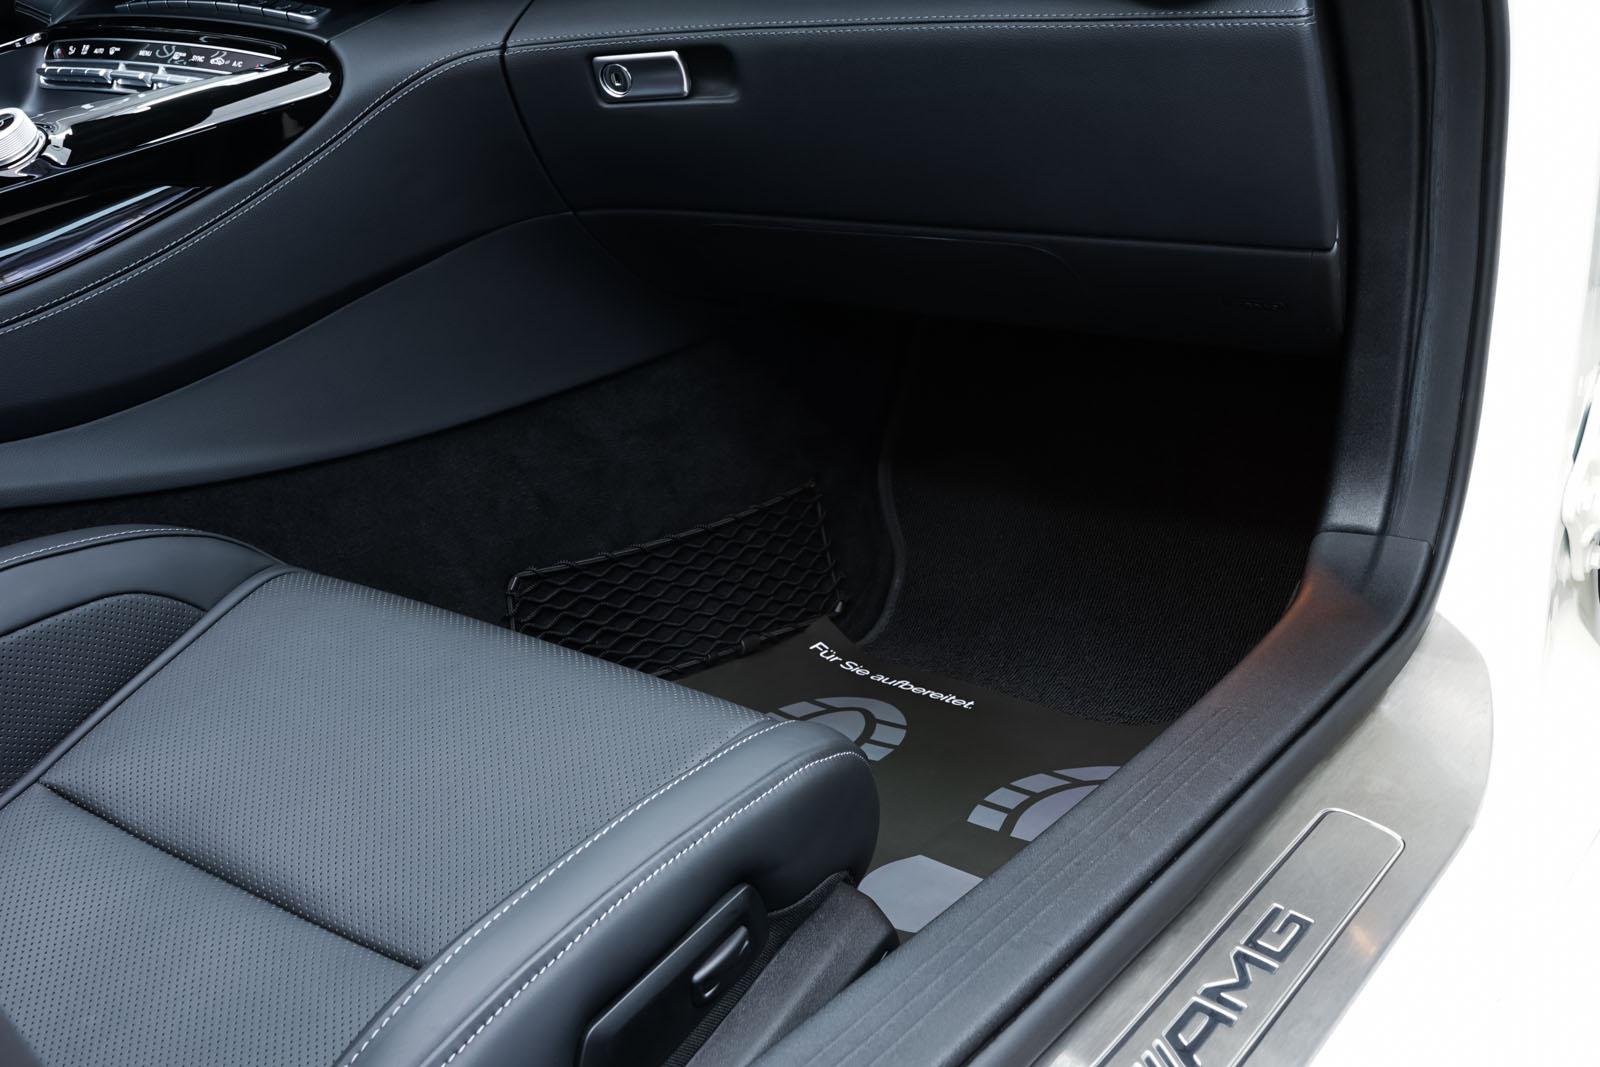 11Mercedes_Benz_AMG_GT_Roadster_Weiss_Schwarz_MB-9710_17_w